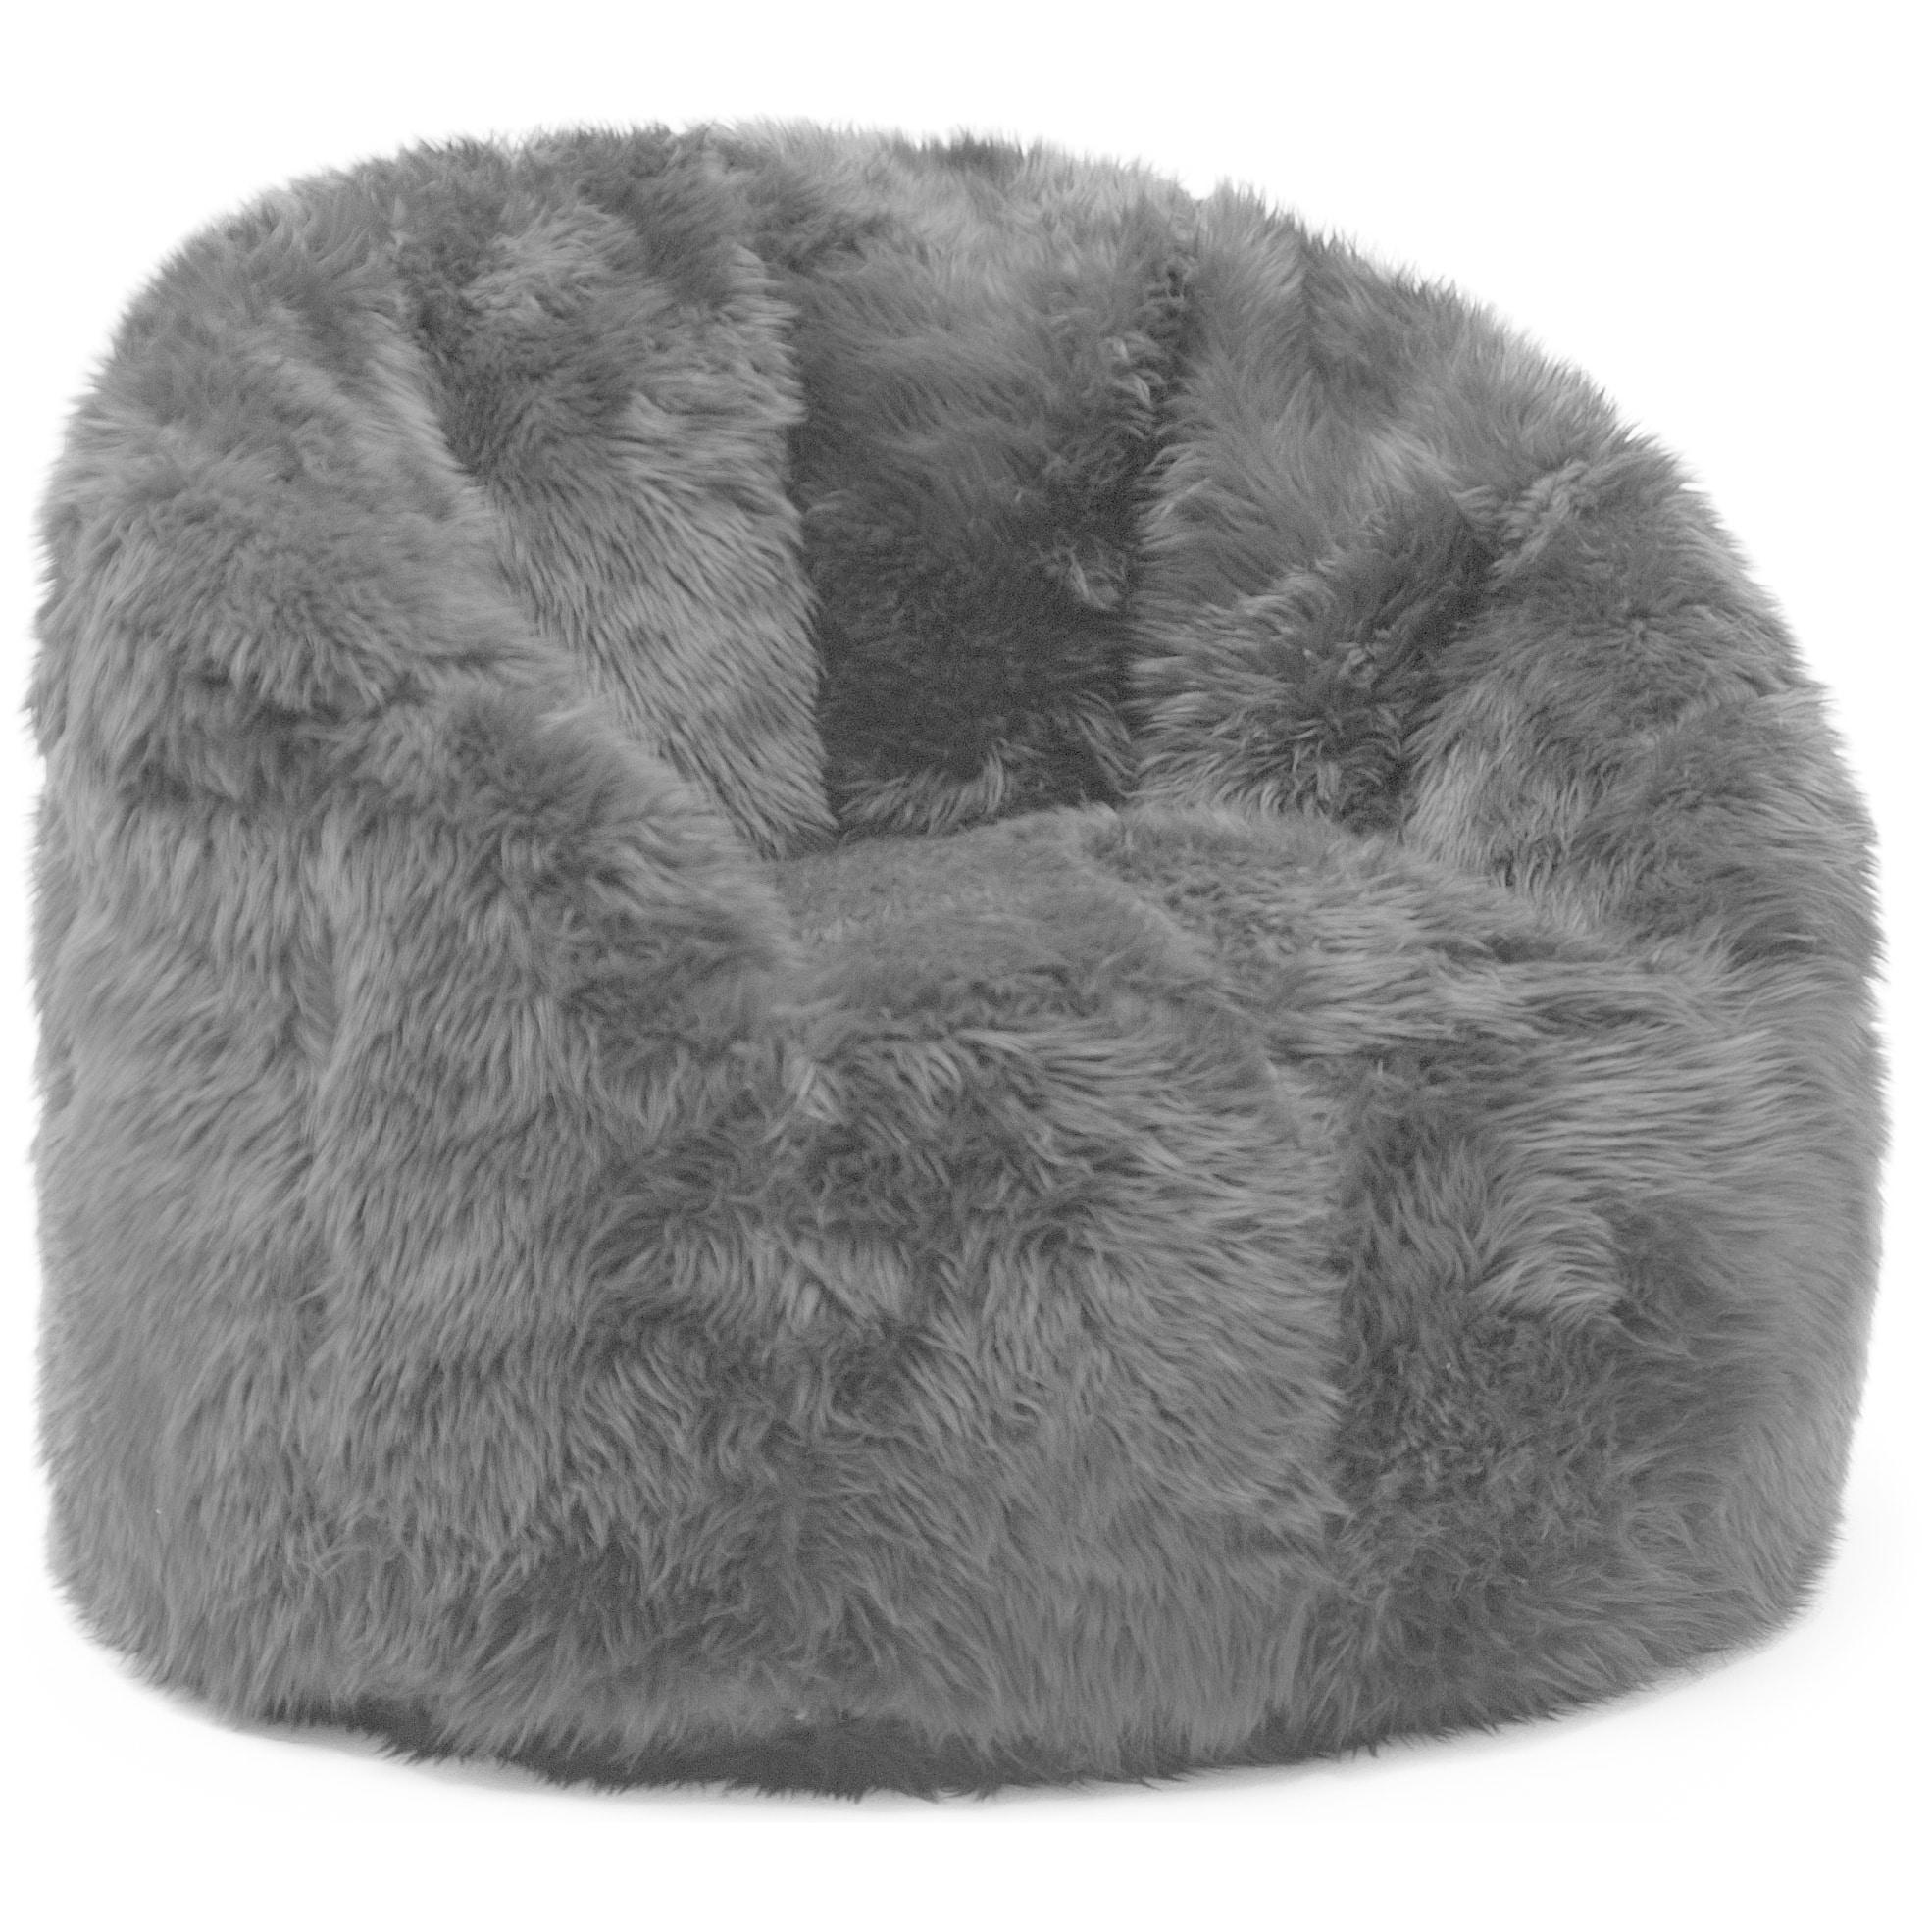 Shop Big Joe Lux Milano Shag Fur Chair - Free Shipping Today -  Overstock.com - 9539001 fc4e20ef77